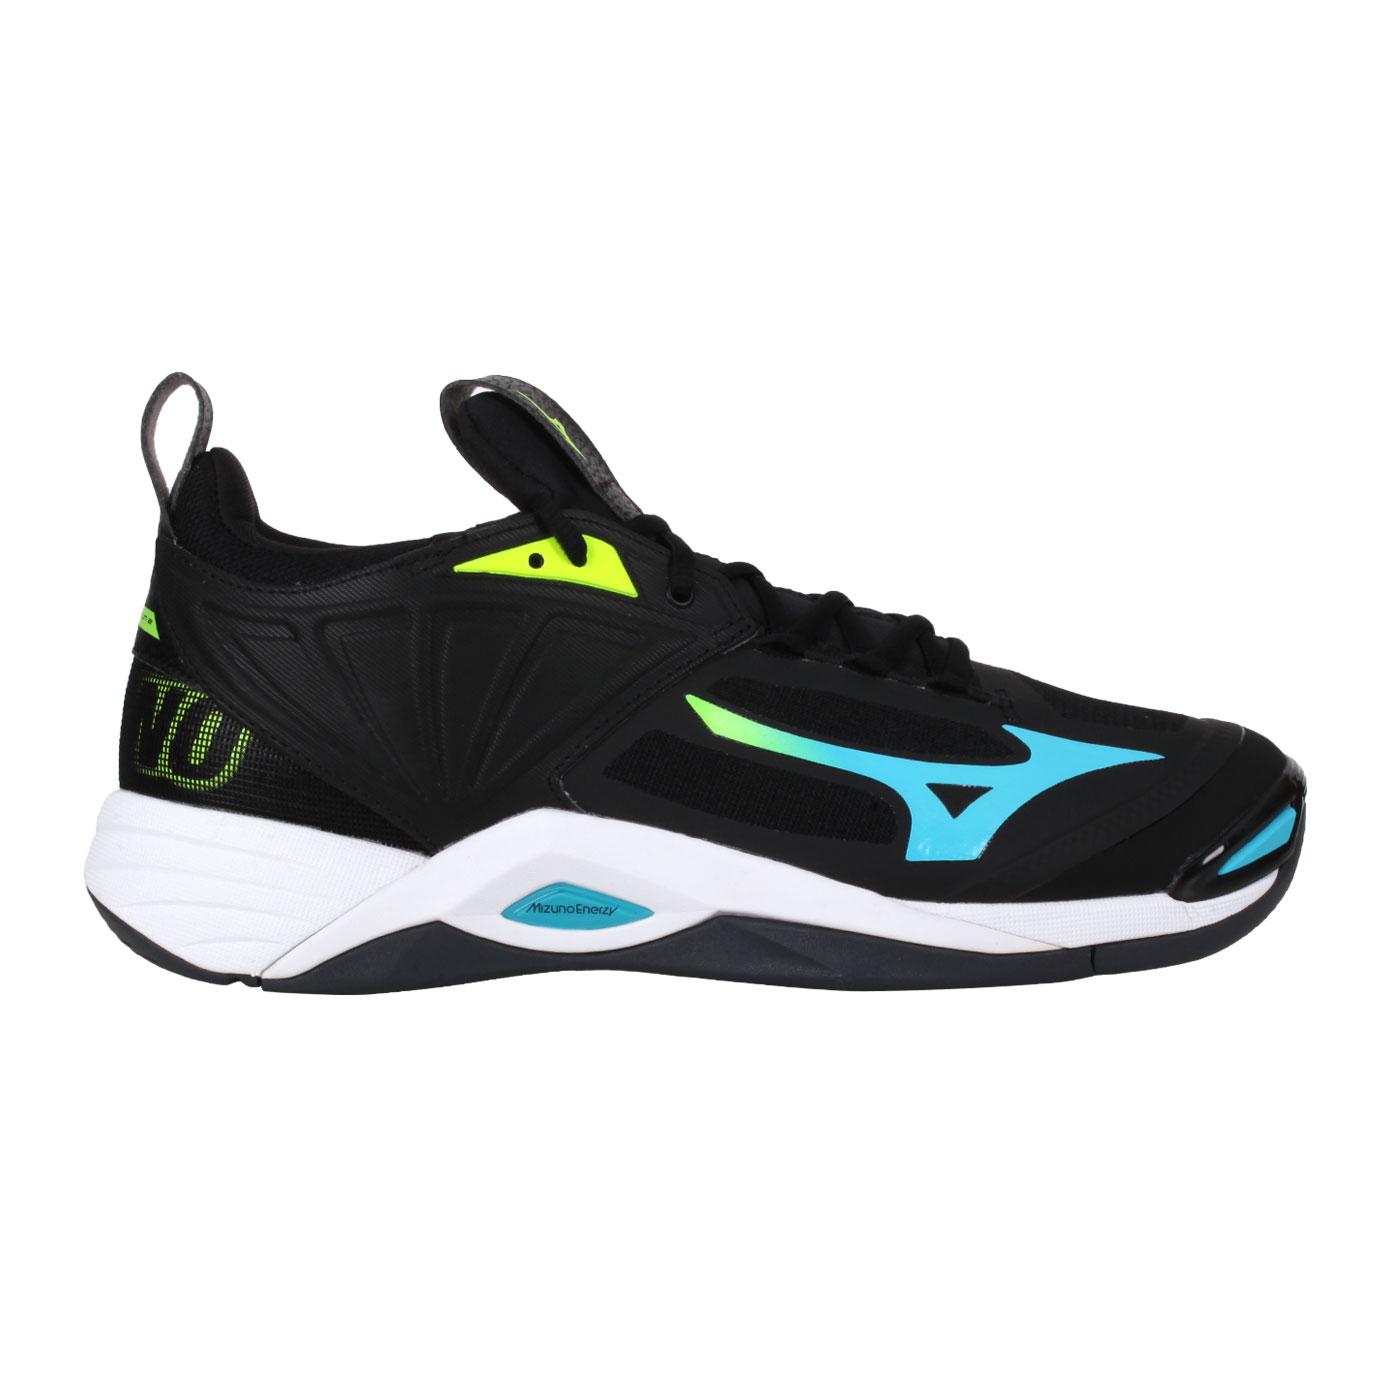 MIZUNO 男款排球鞋  @WAVE MOMENTUM 2@V1GA211223 - 黑黃藍